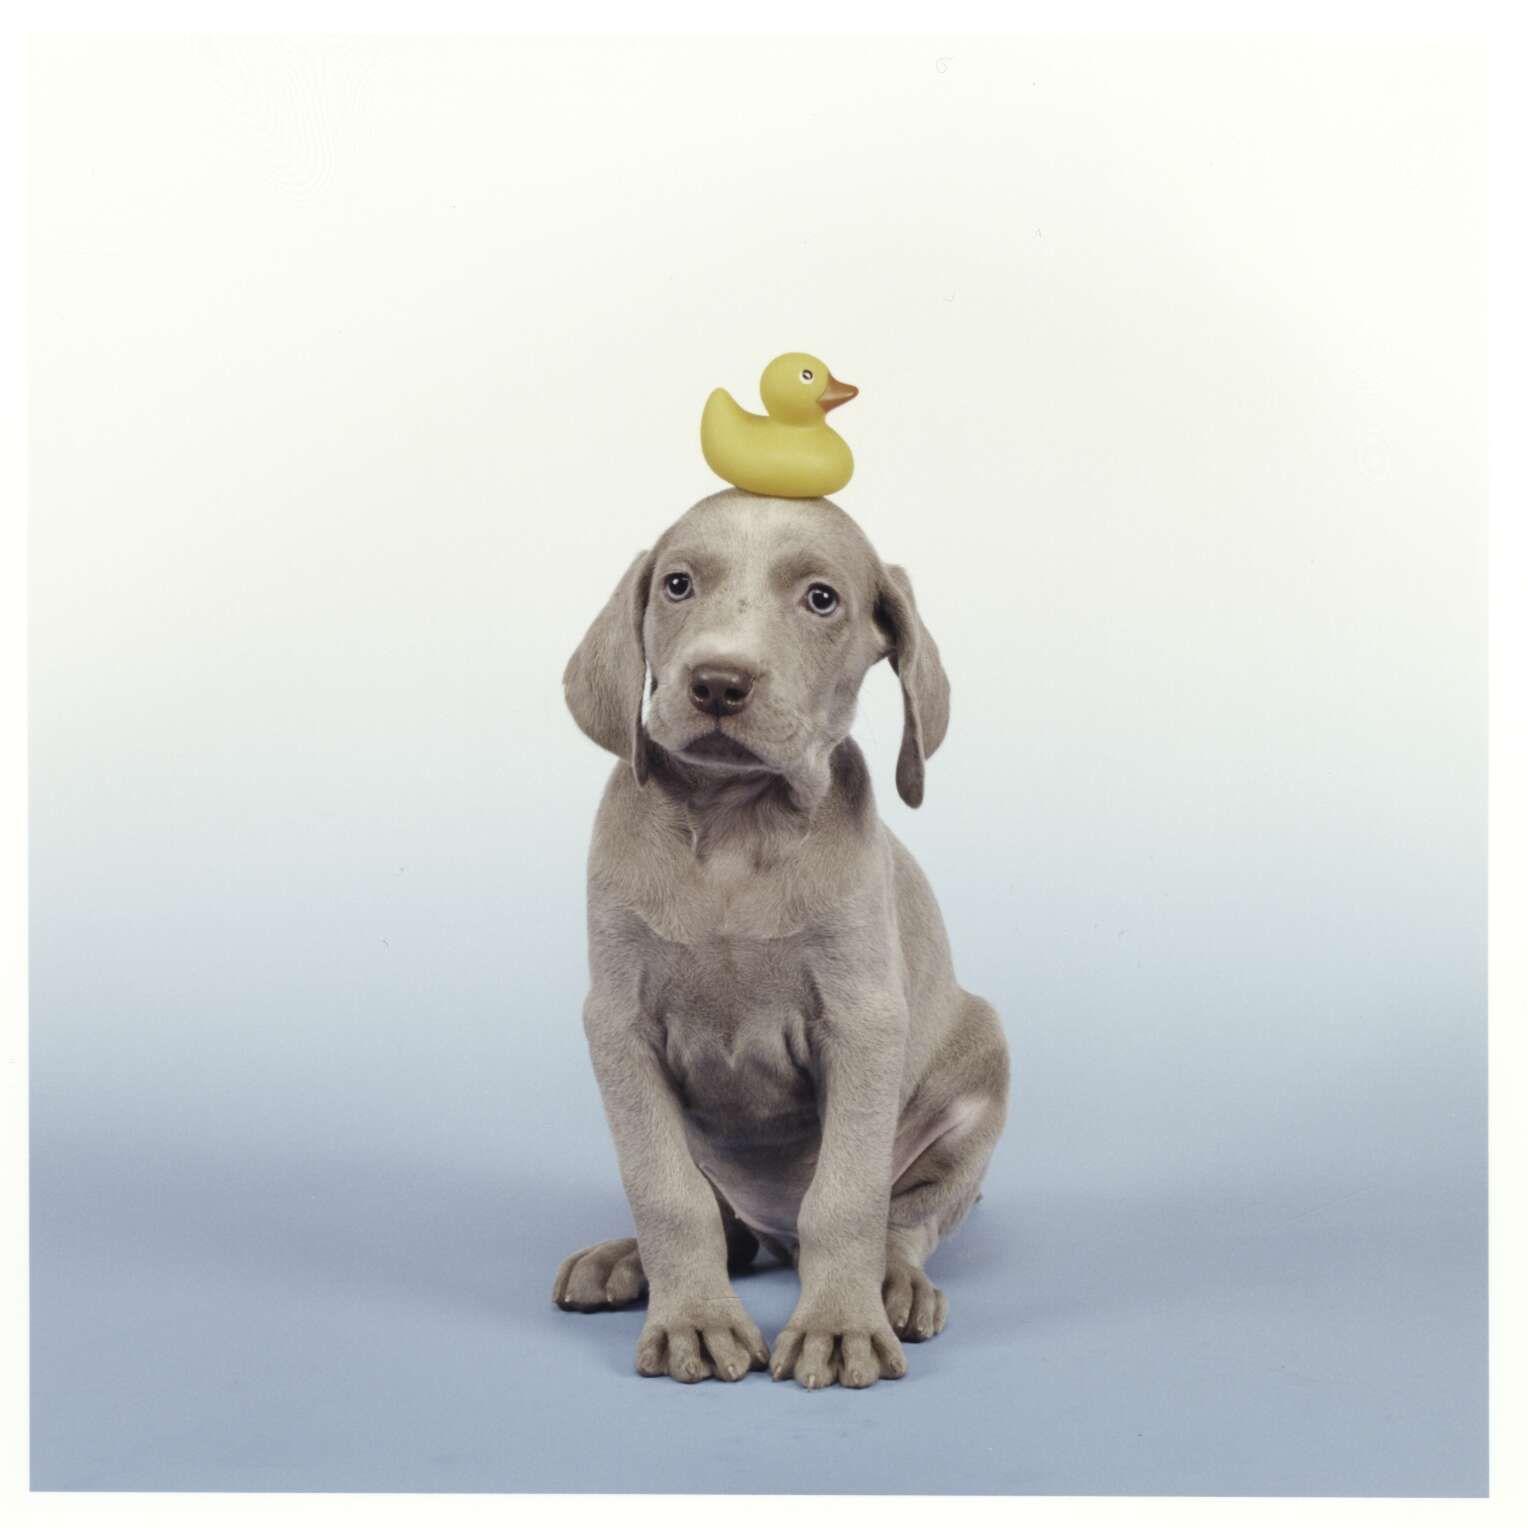 William wegman duck 2003 puppies pinterest weimaraner dog ready to take a bath puppy with duckling nvjuhfo Image collections